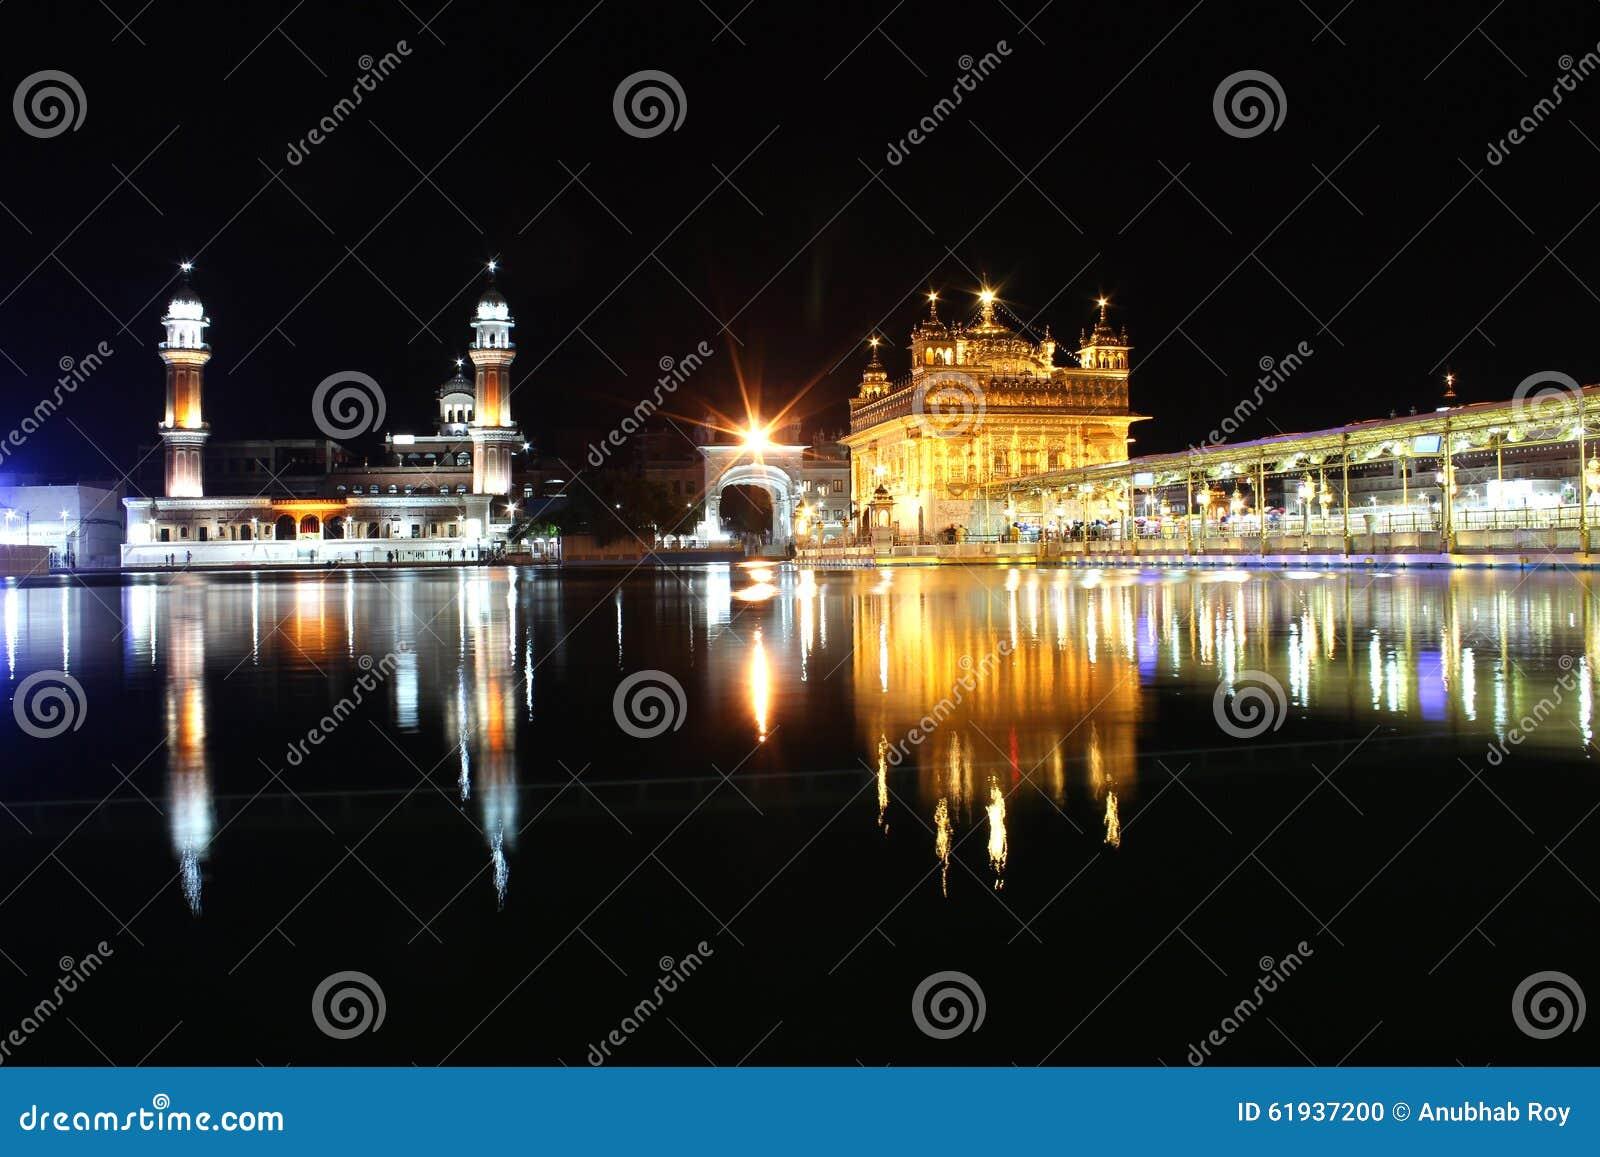 The Golden Temple, Amritsar, Punjab, India Editorial Image